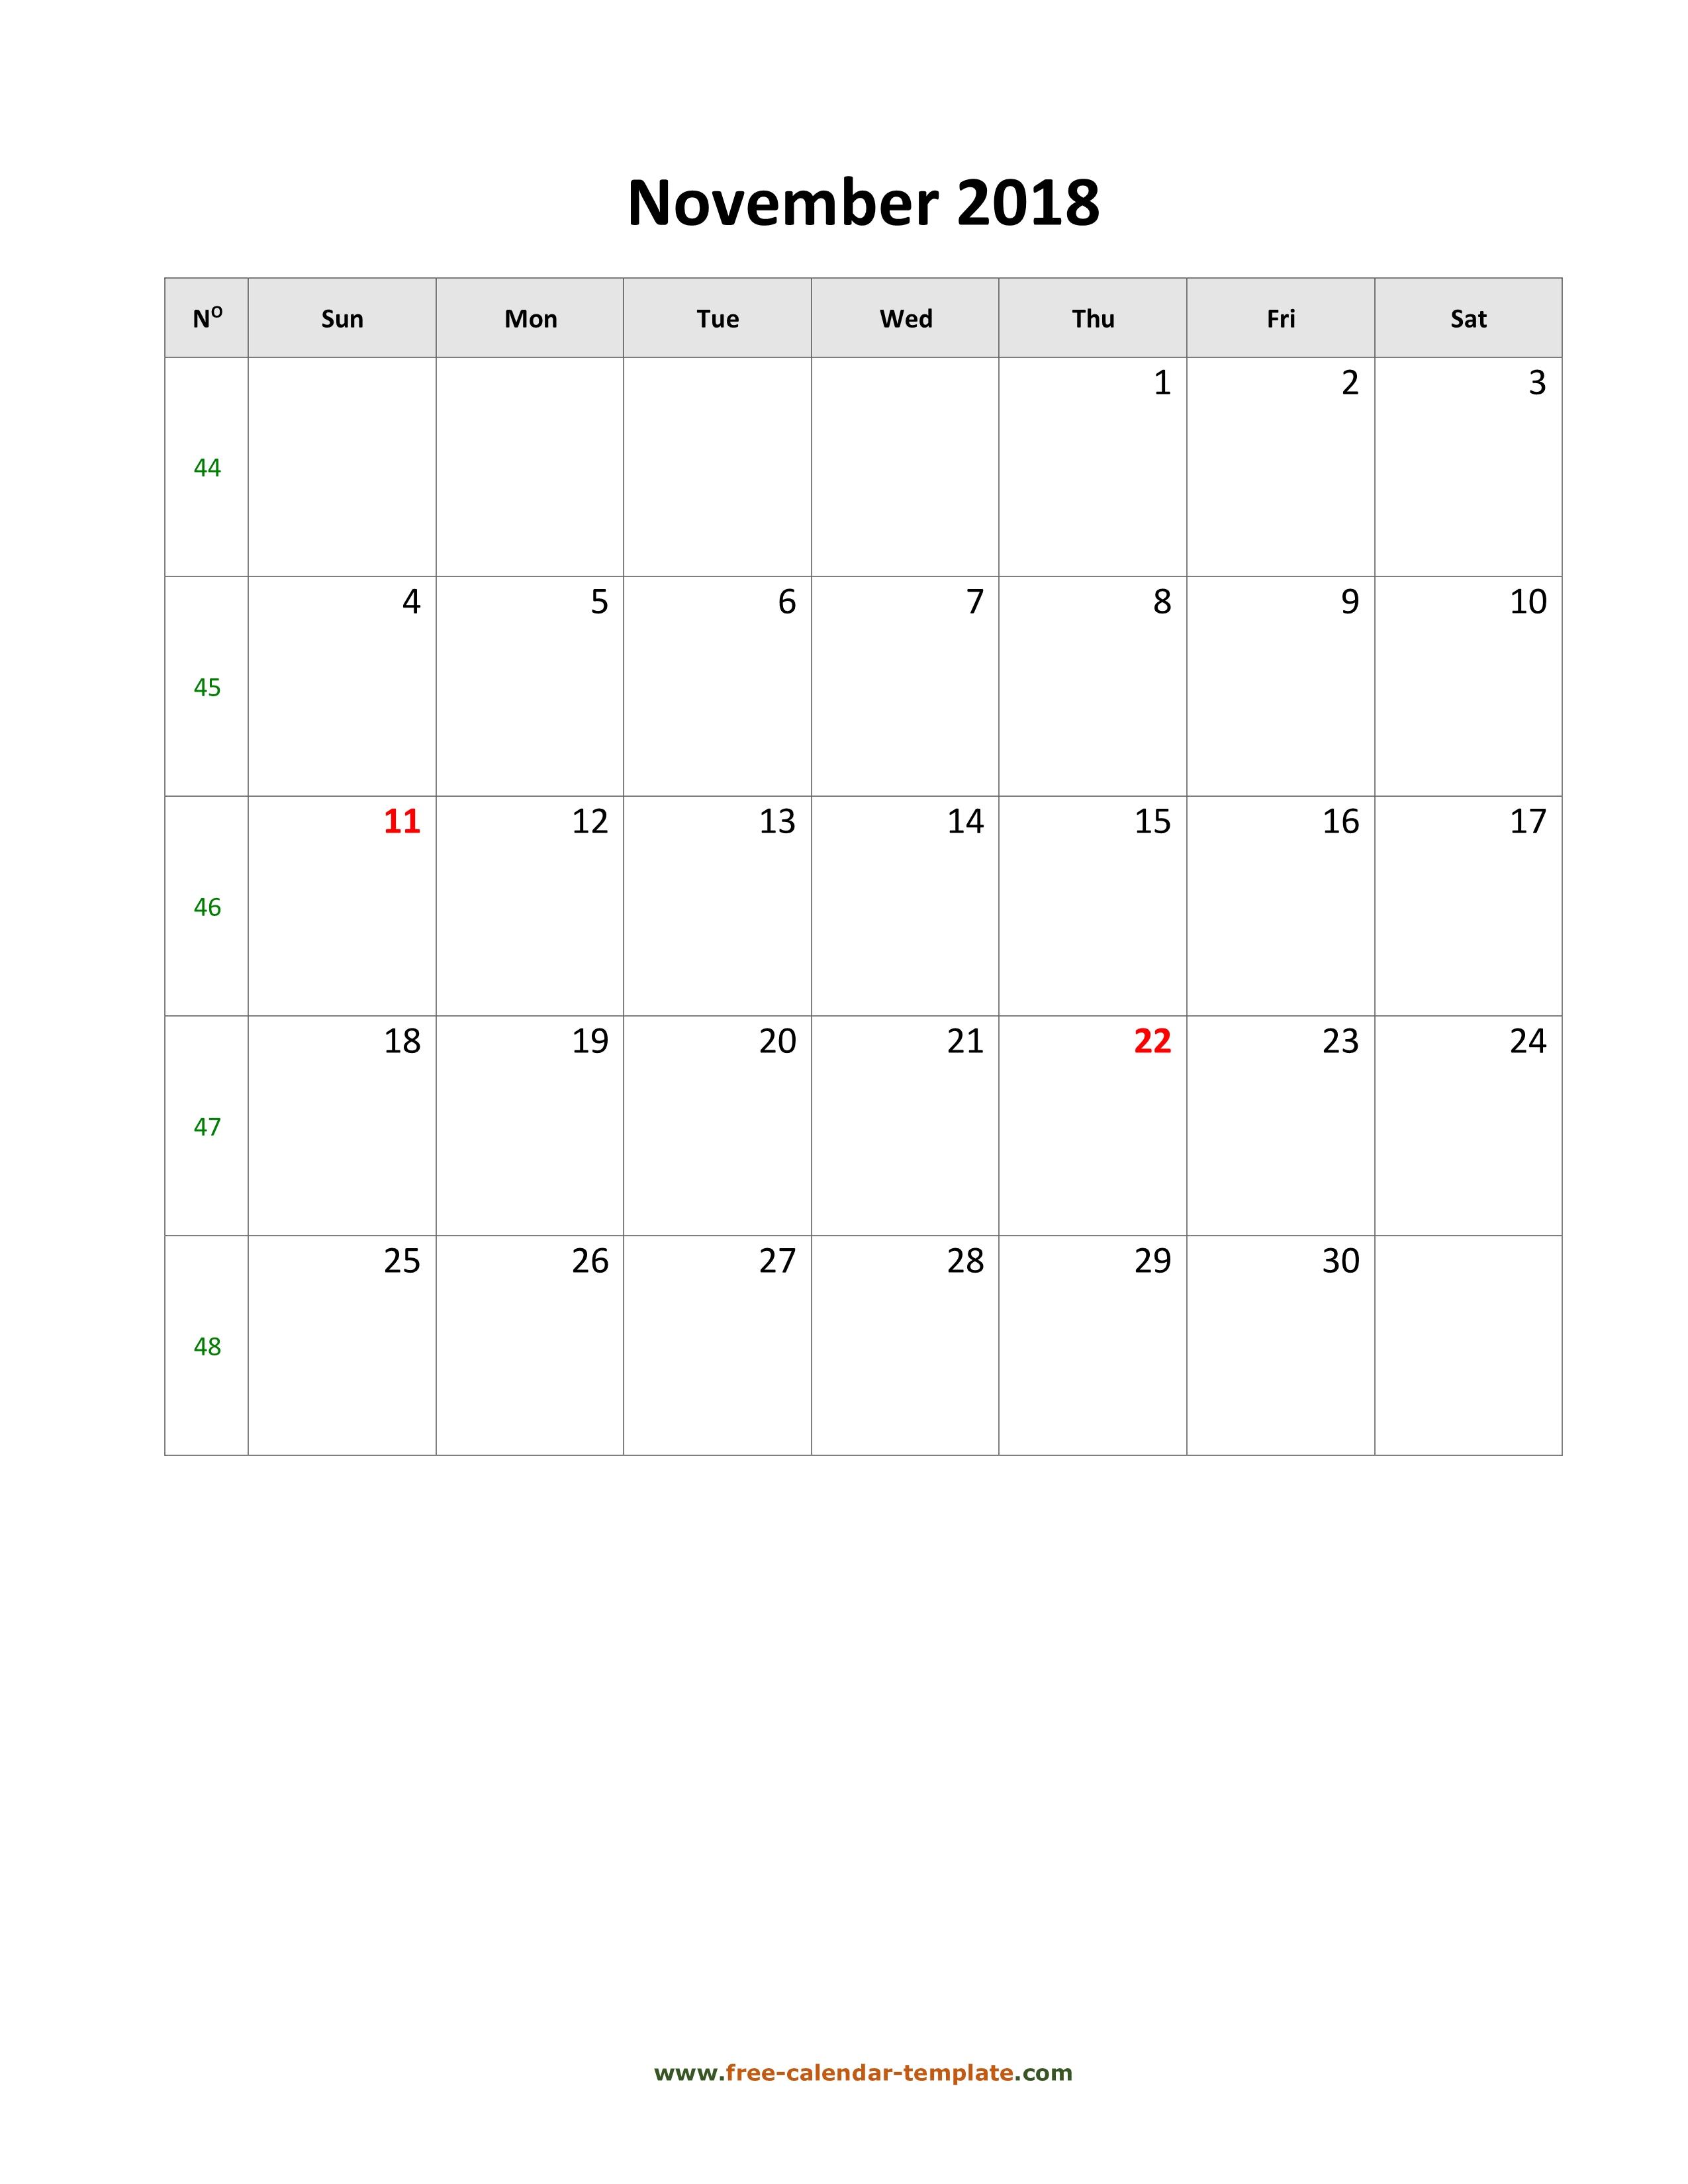 november 2018 calendar simple vertical view large image print